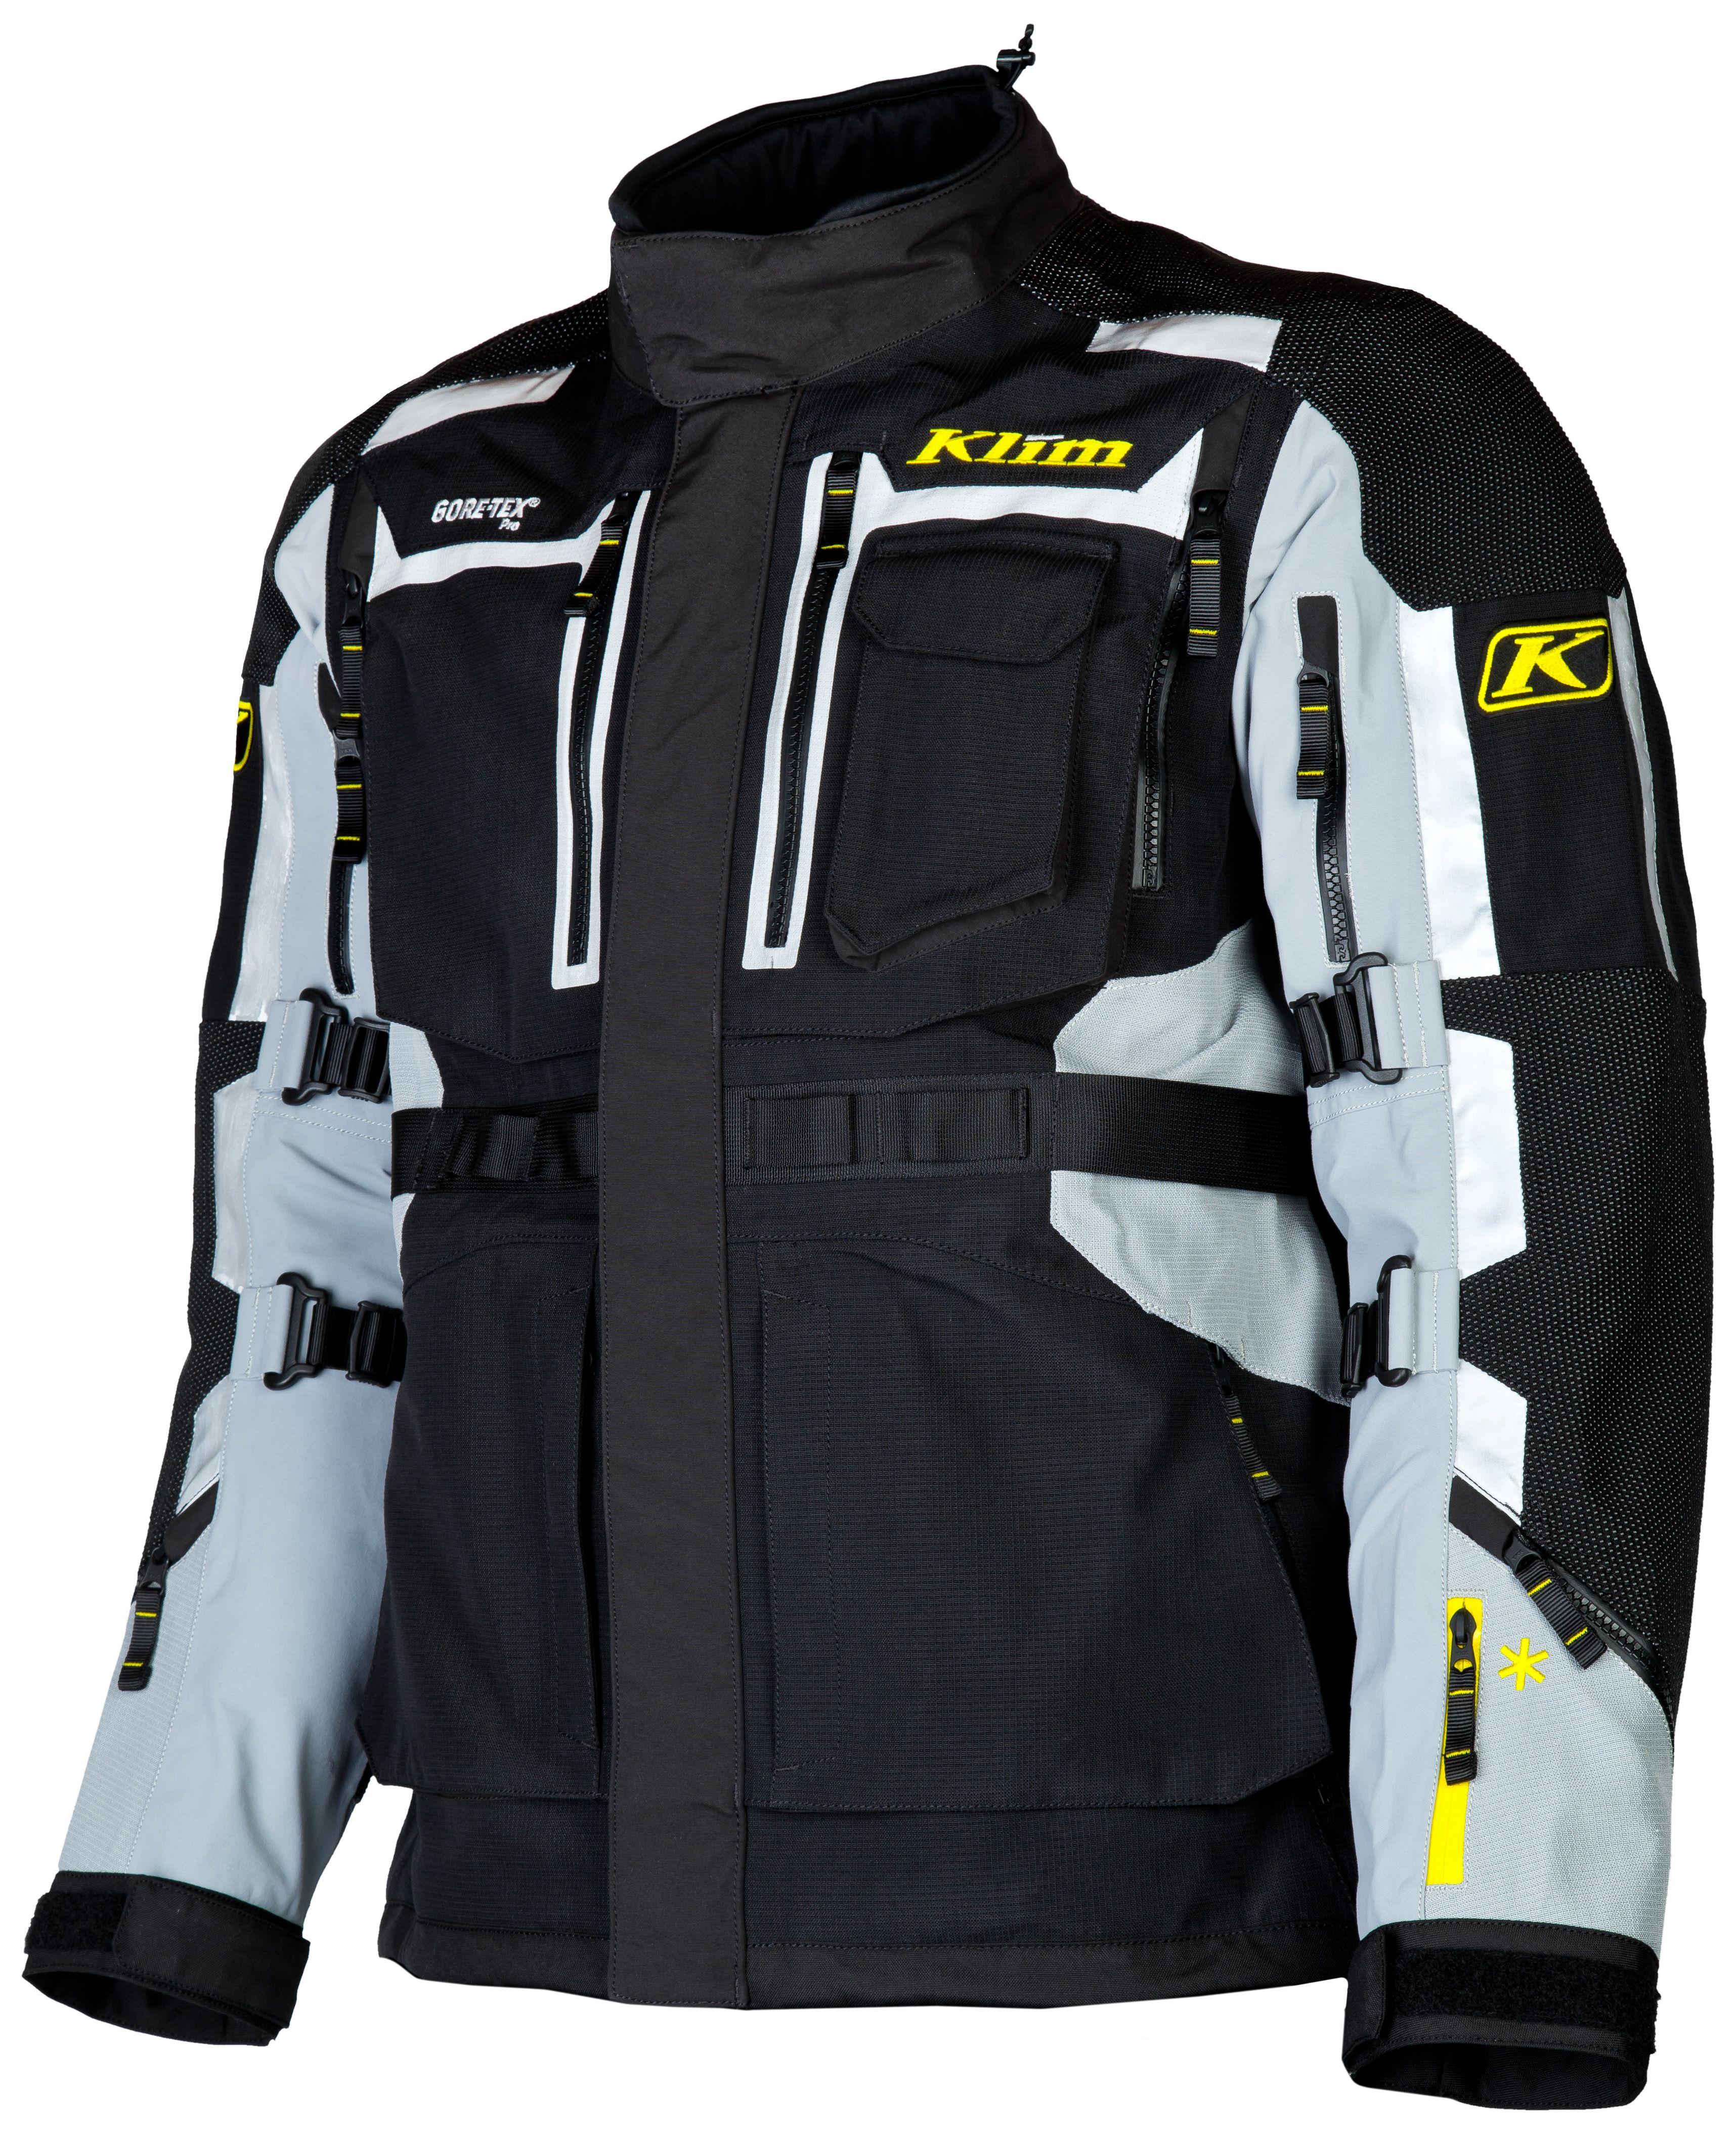 klim adventure rally jacket - revzilla